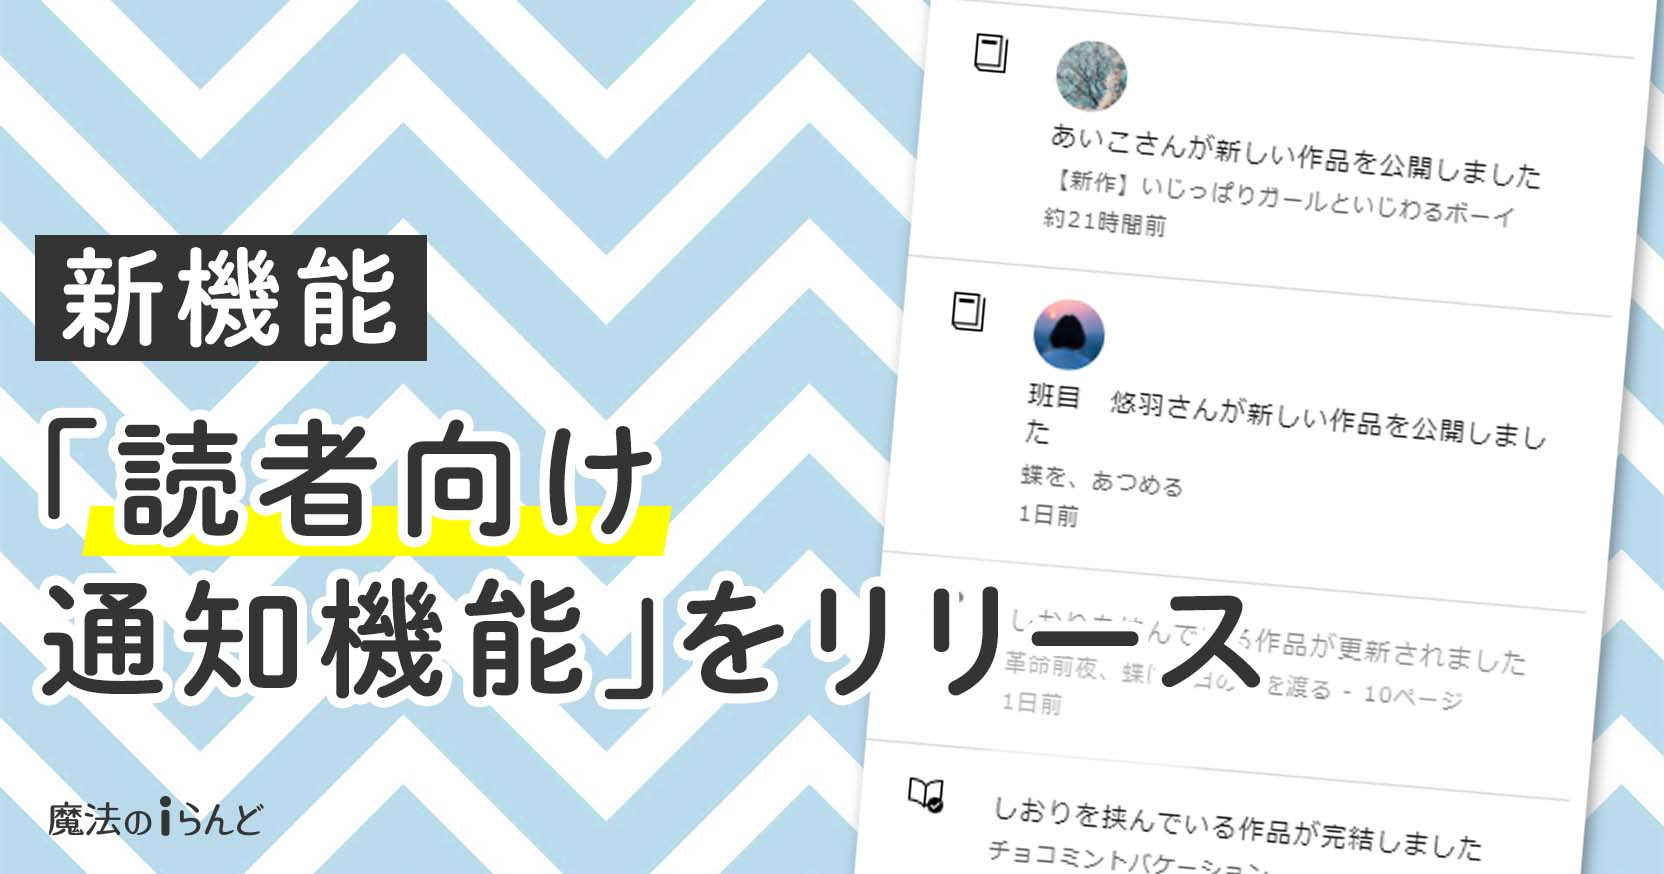 https://storage.googleapis.com/blog-info/entry/2021/09/dokusya_tuuchi_ogp.jpg